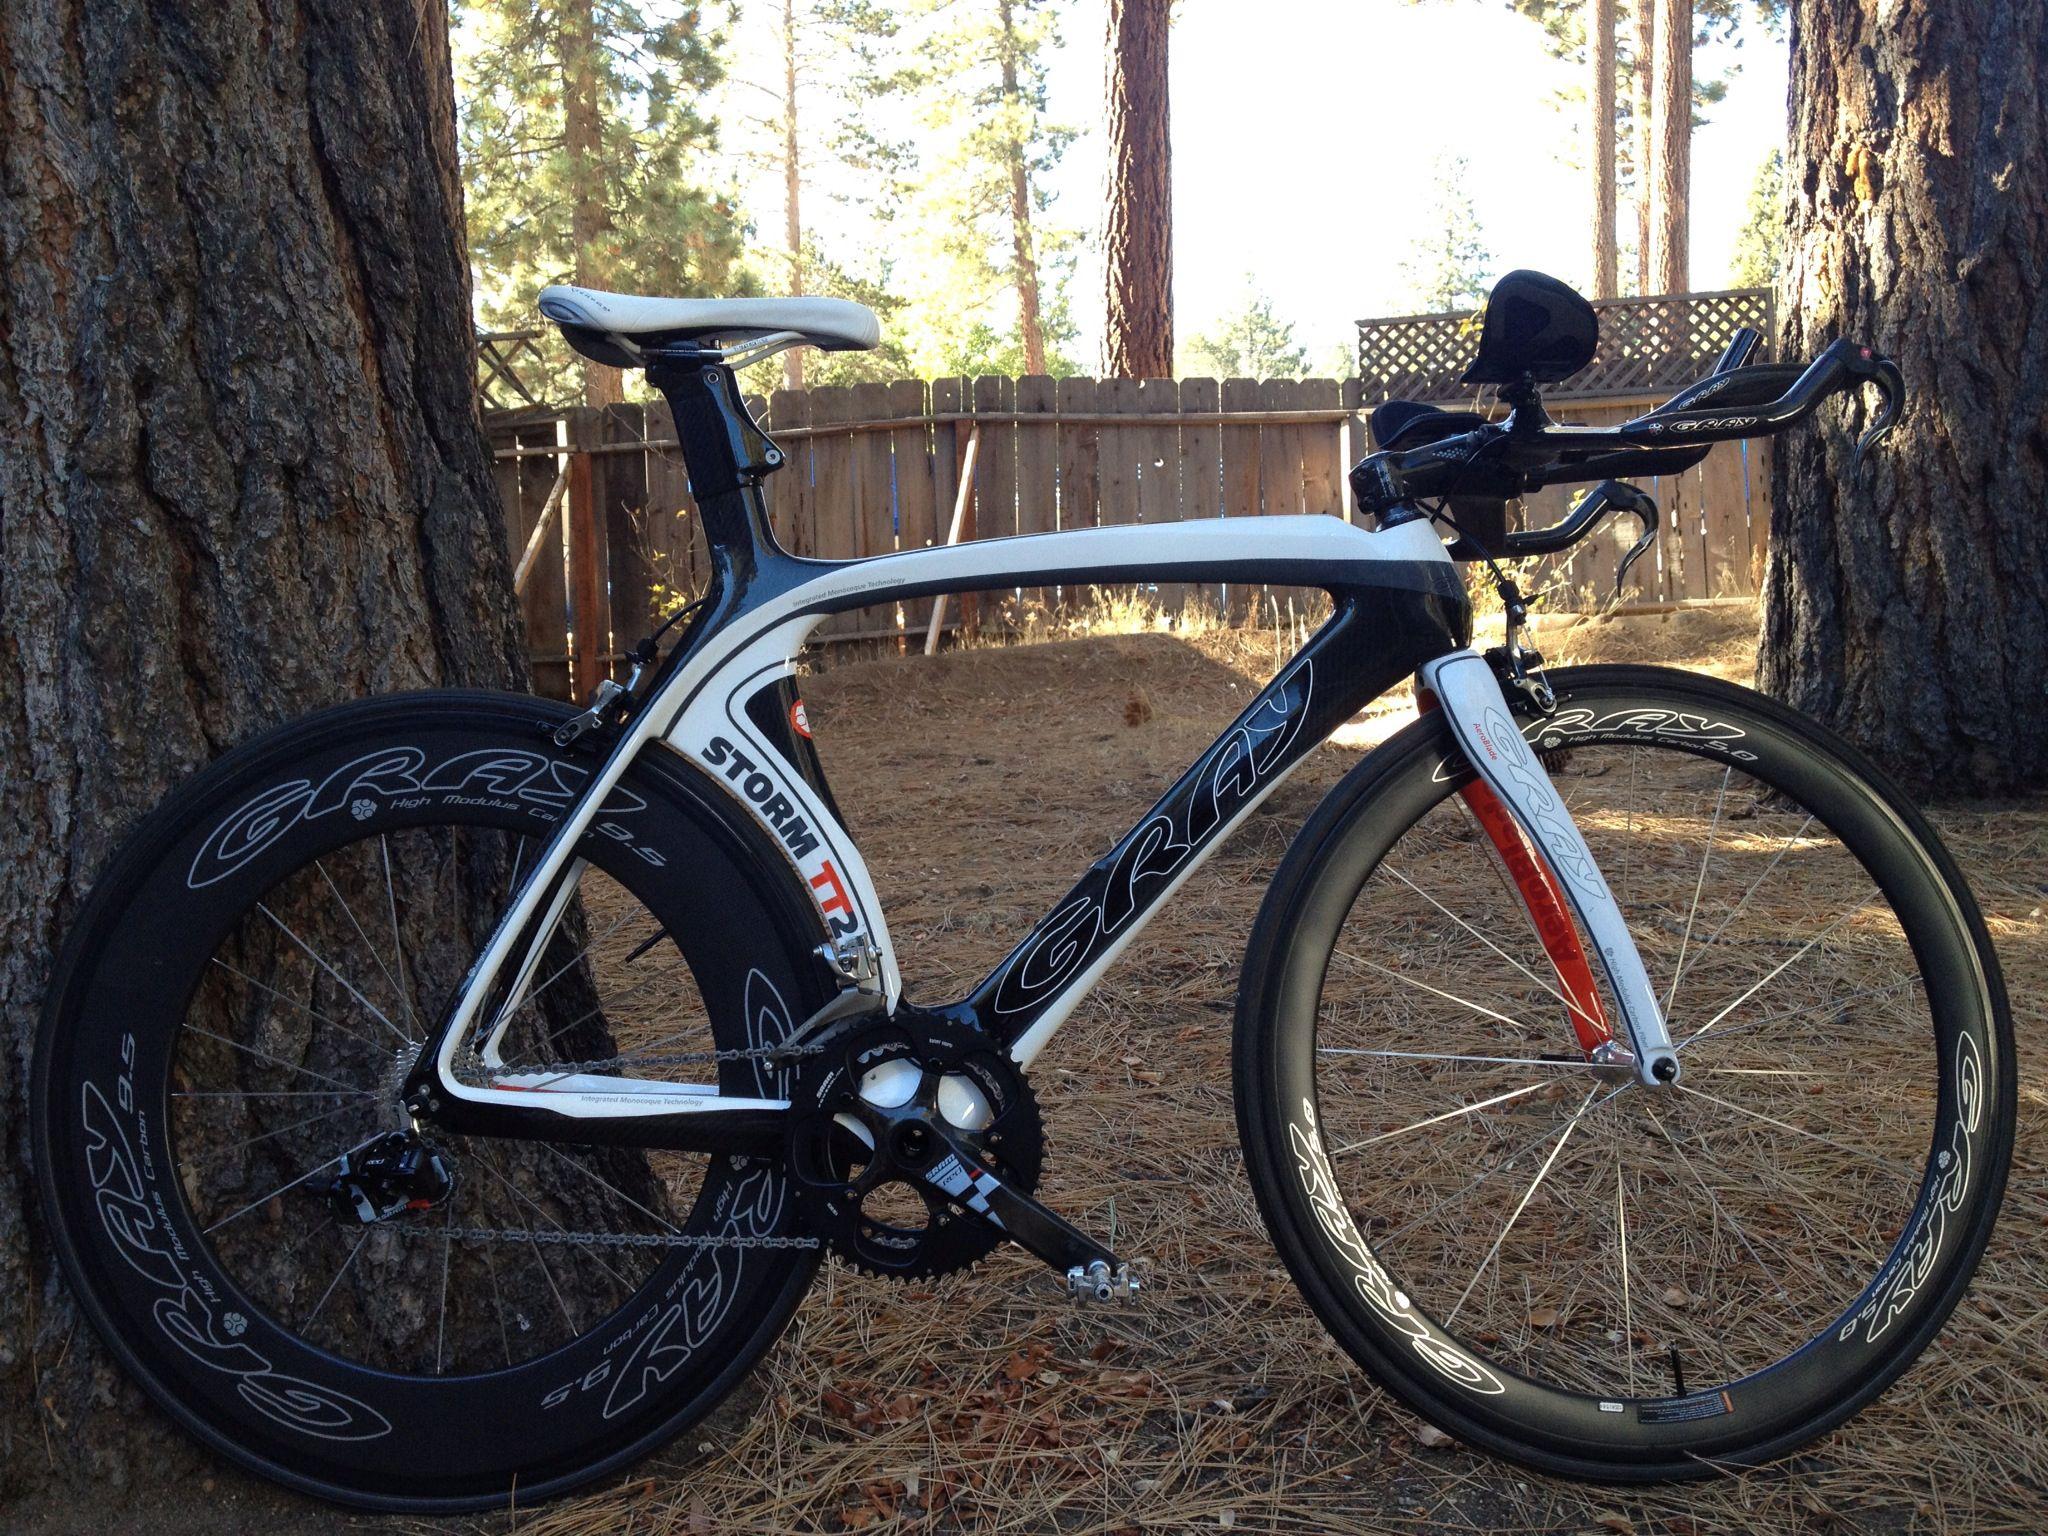 a955896bc0c GRAY Storm TT2 | Carbon Bikes! | Bicycle, Bike, Vehicles